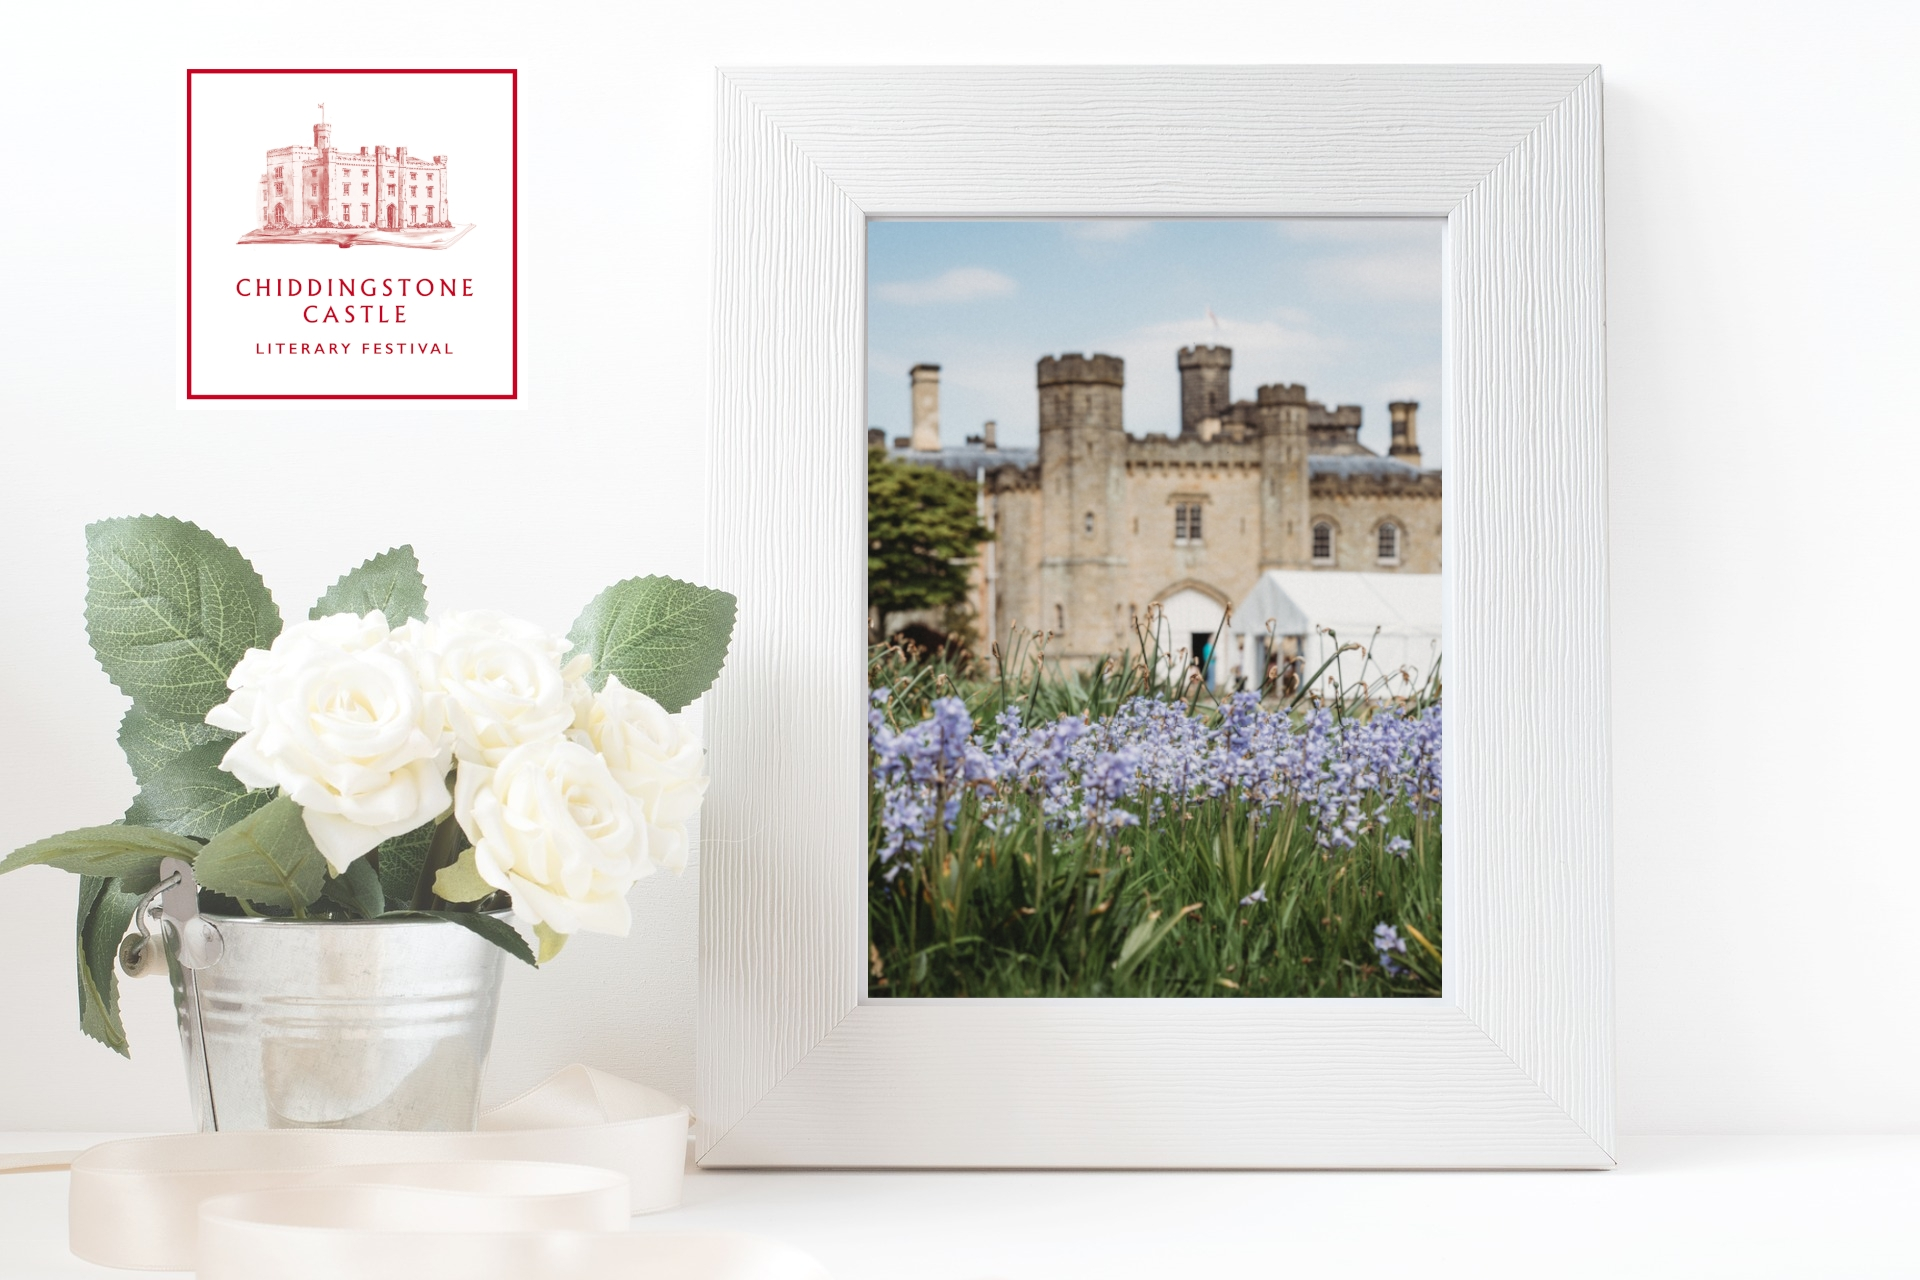 Chiddingstone Castle Literary Festival May 7-10th 2020!